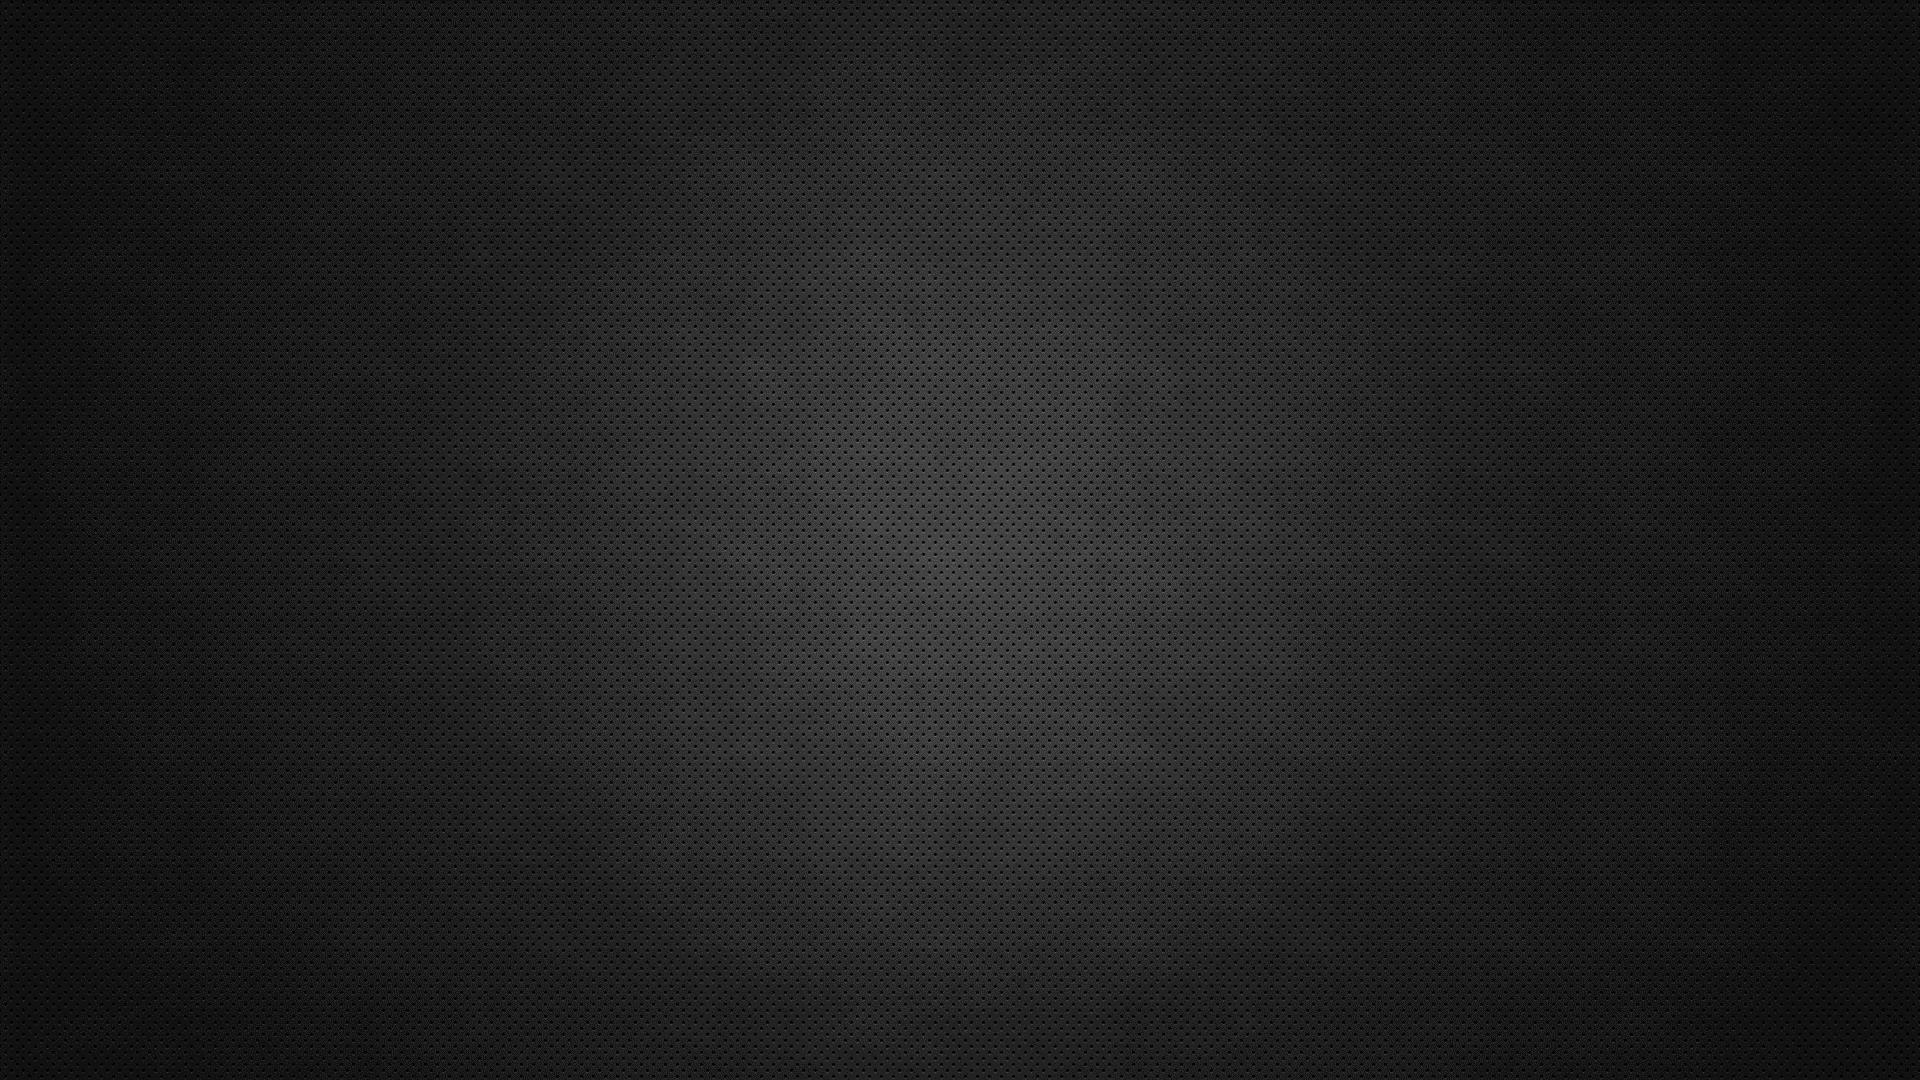 black hd wallpaper 1920x1080 13 desktop background